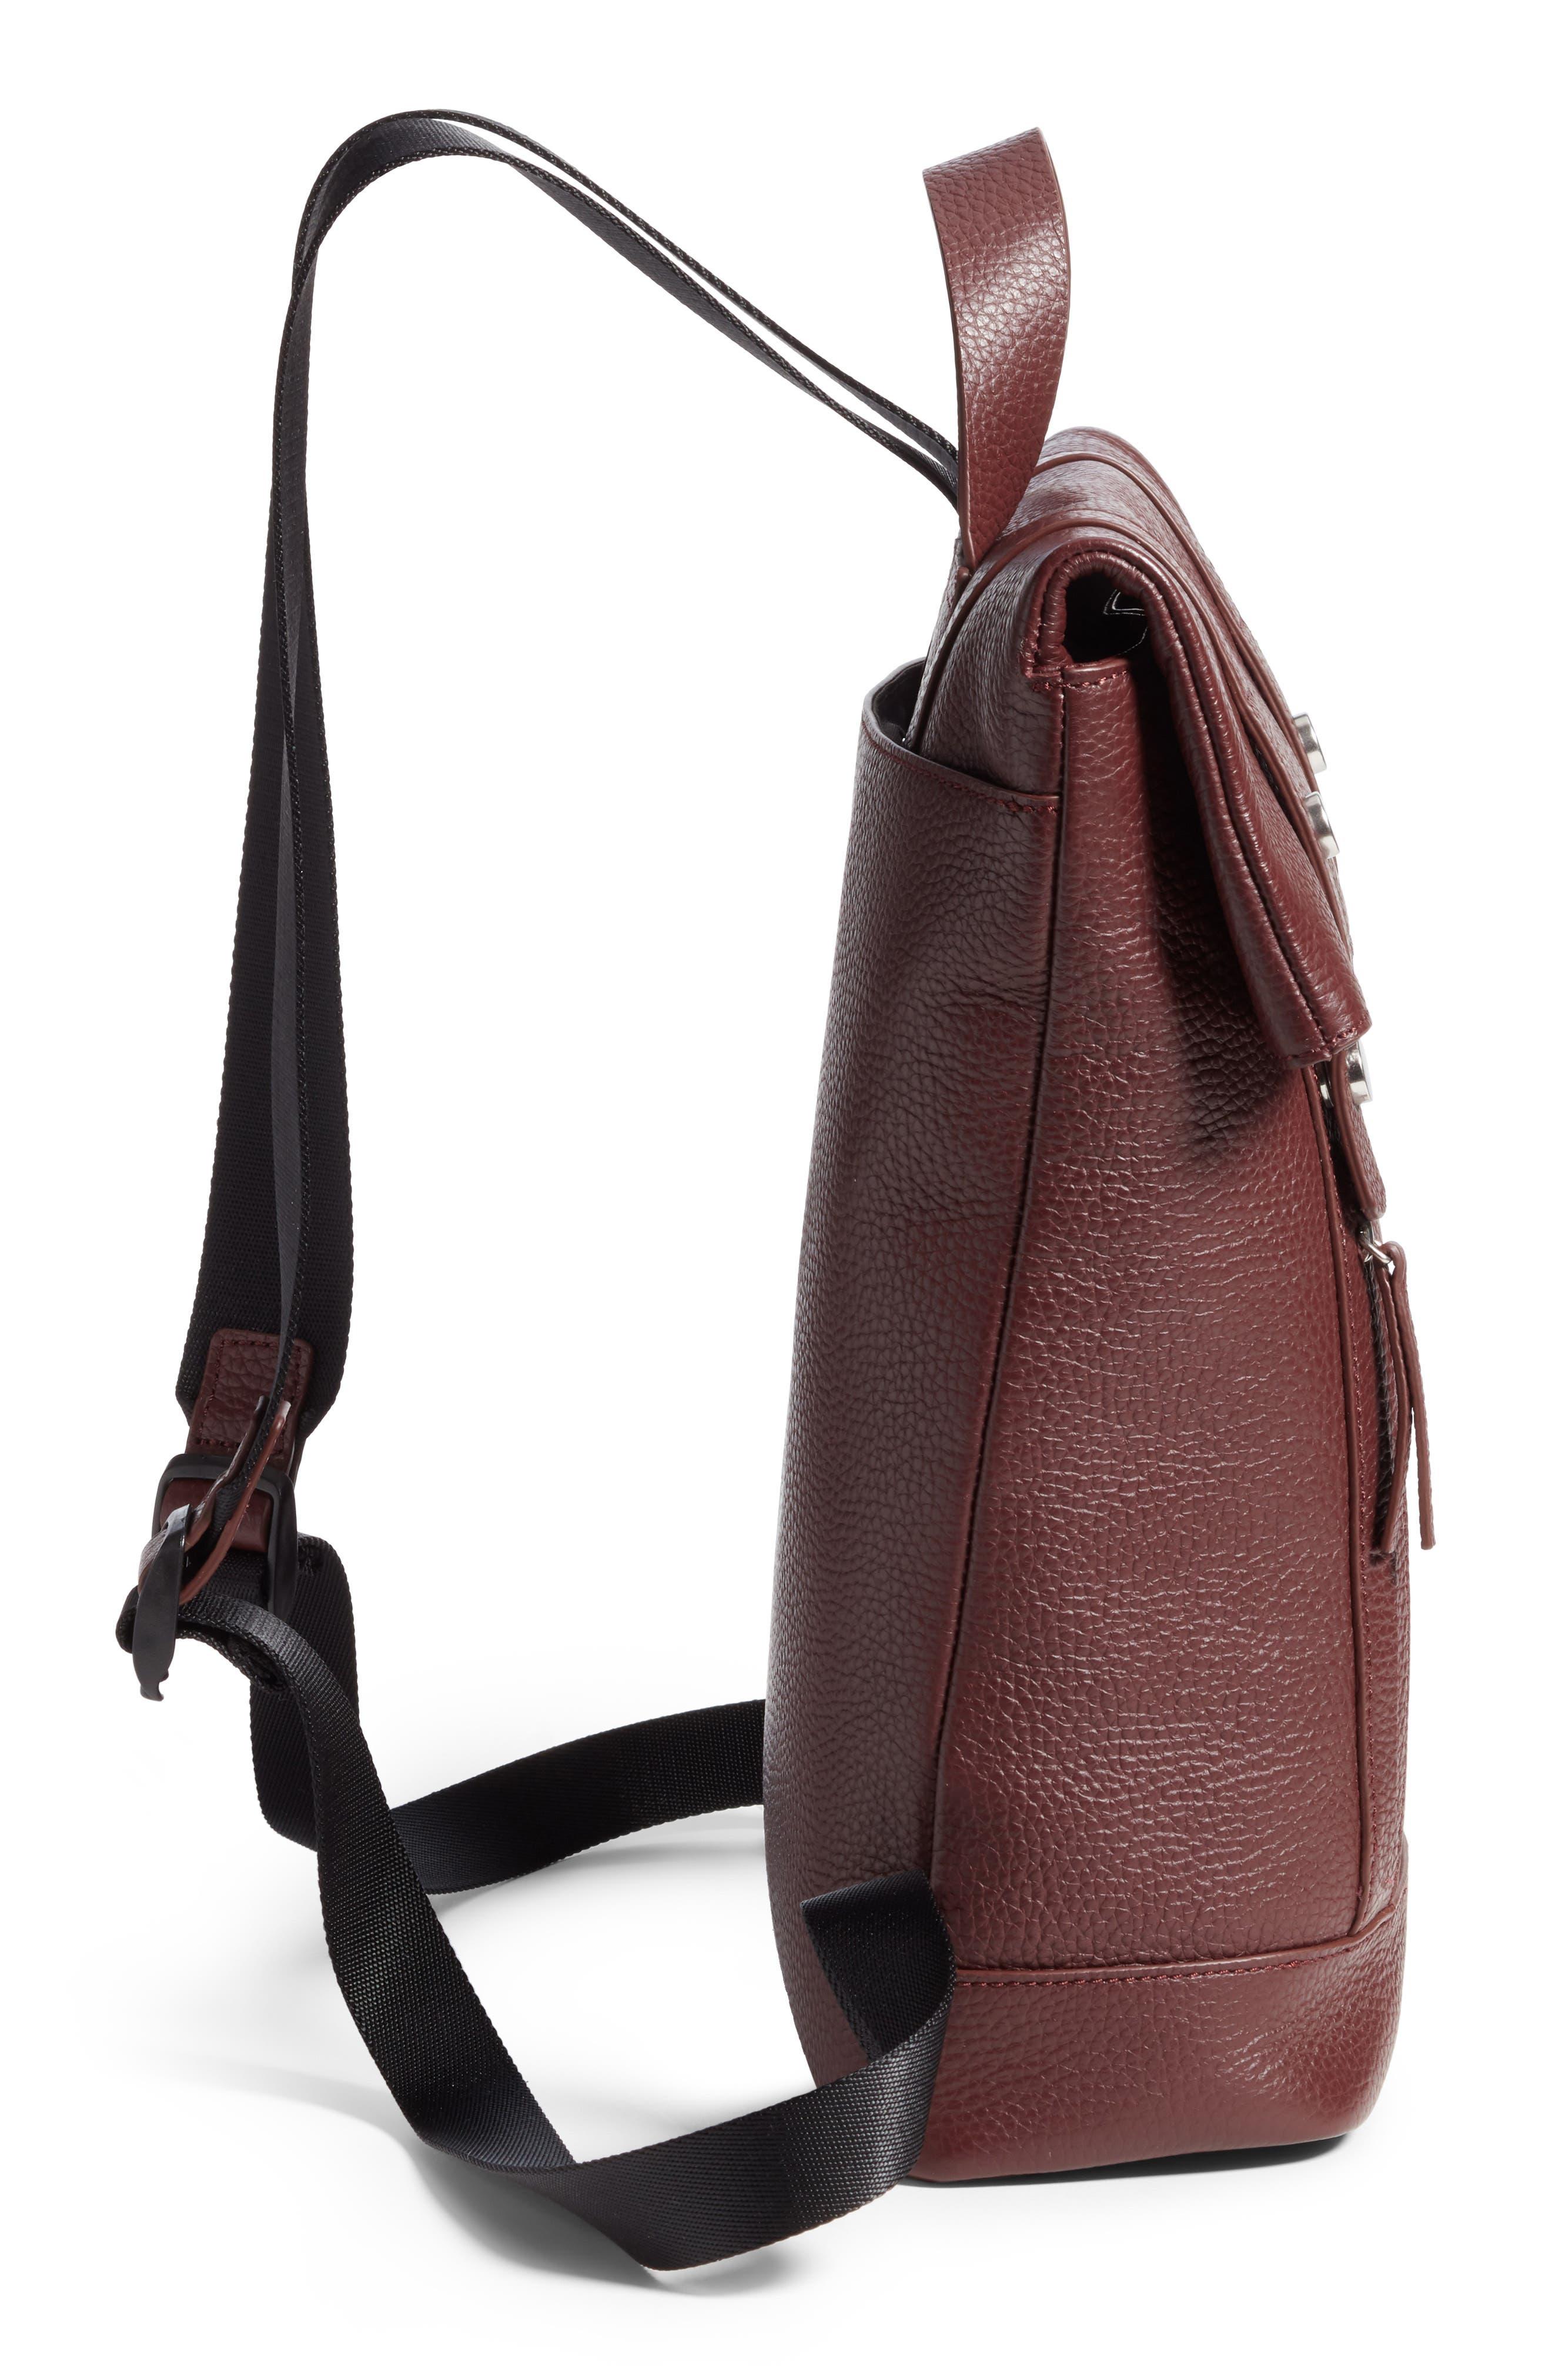 Remy Pebbled Leather Backpack,                             Alternate thumbnail 5, color,                             BURGUNDY FIG